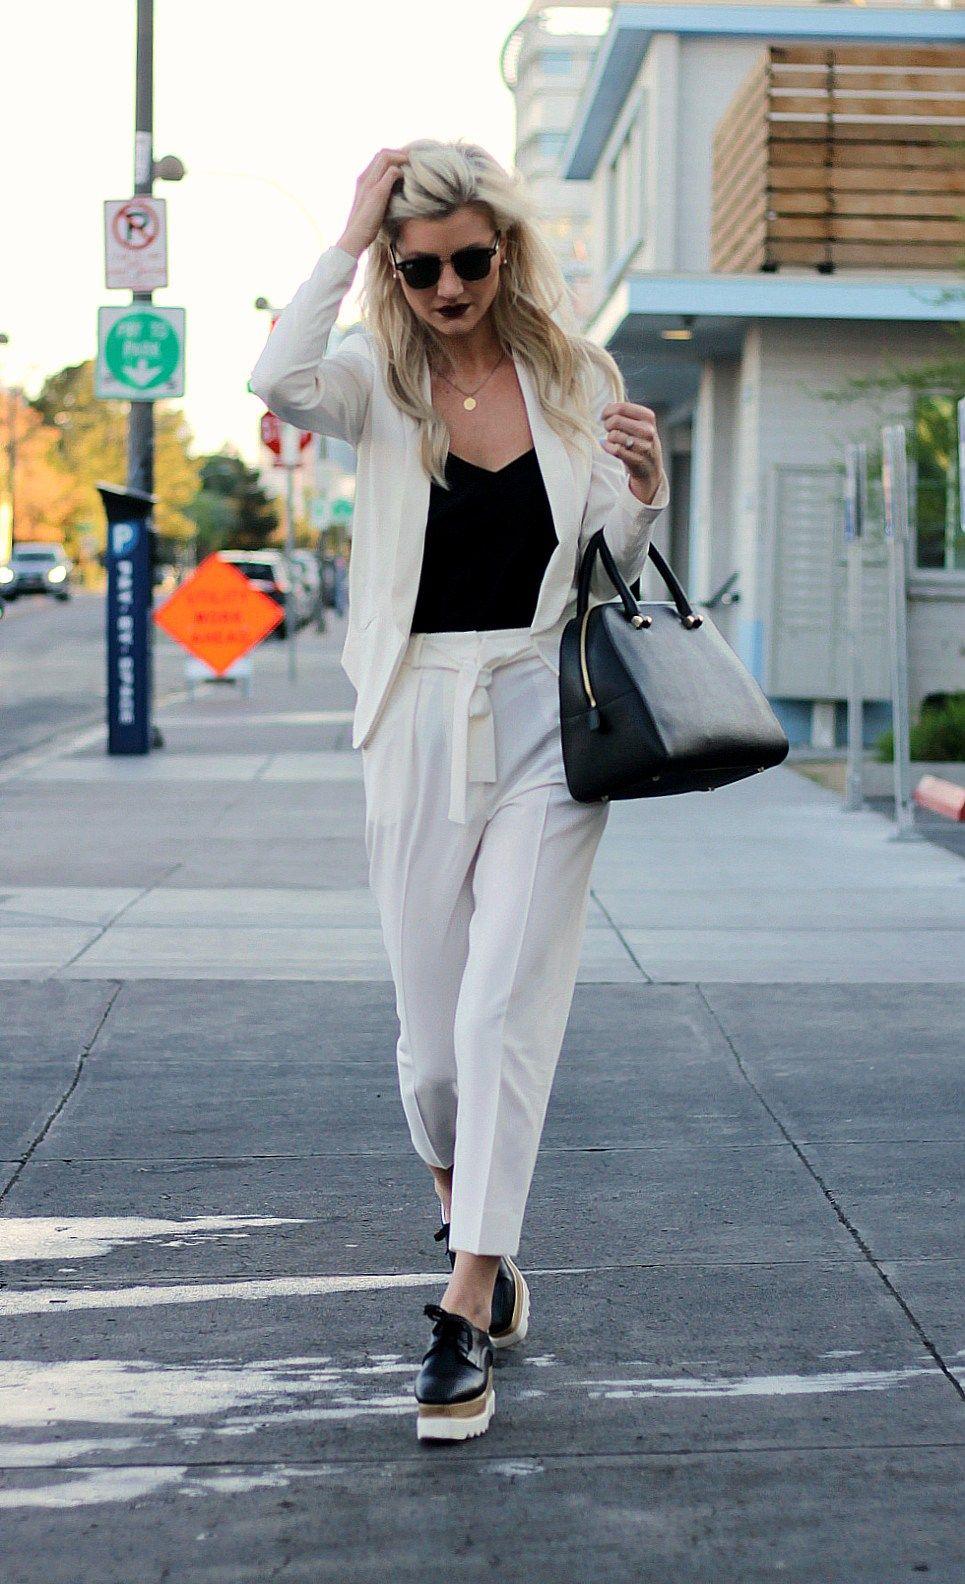 WHITE PANTSUIT & PLATFORM OXFORDS | Pinterest | White pants, Style ...